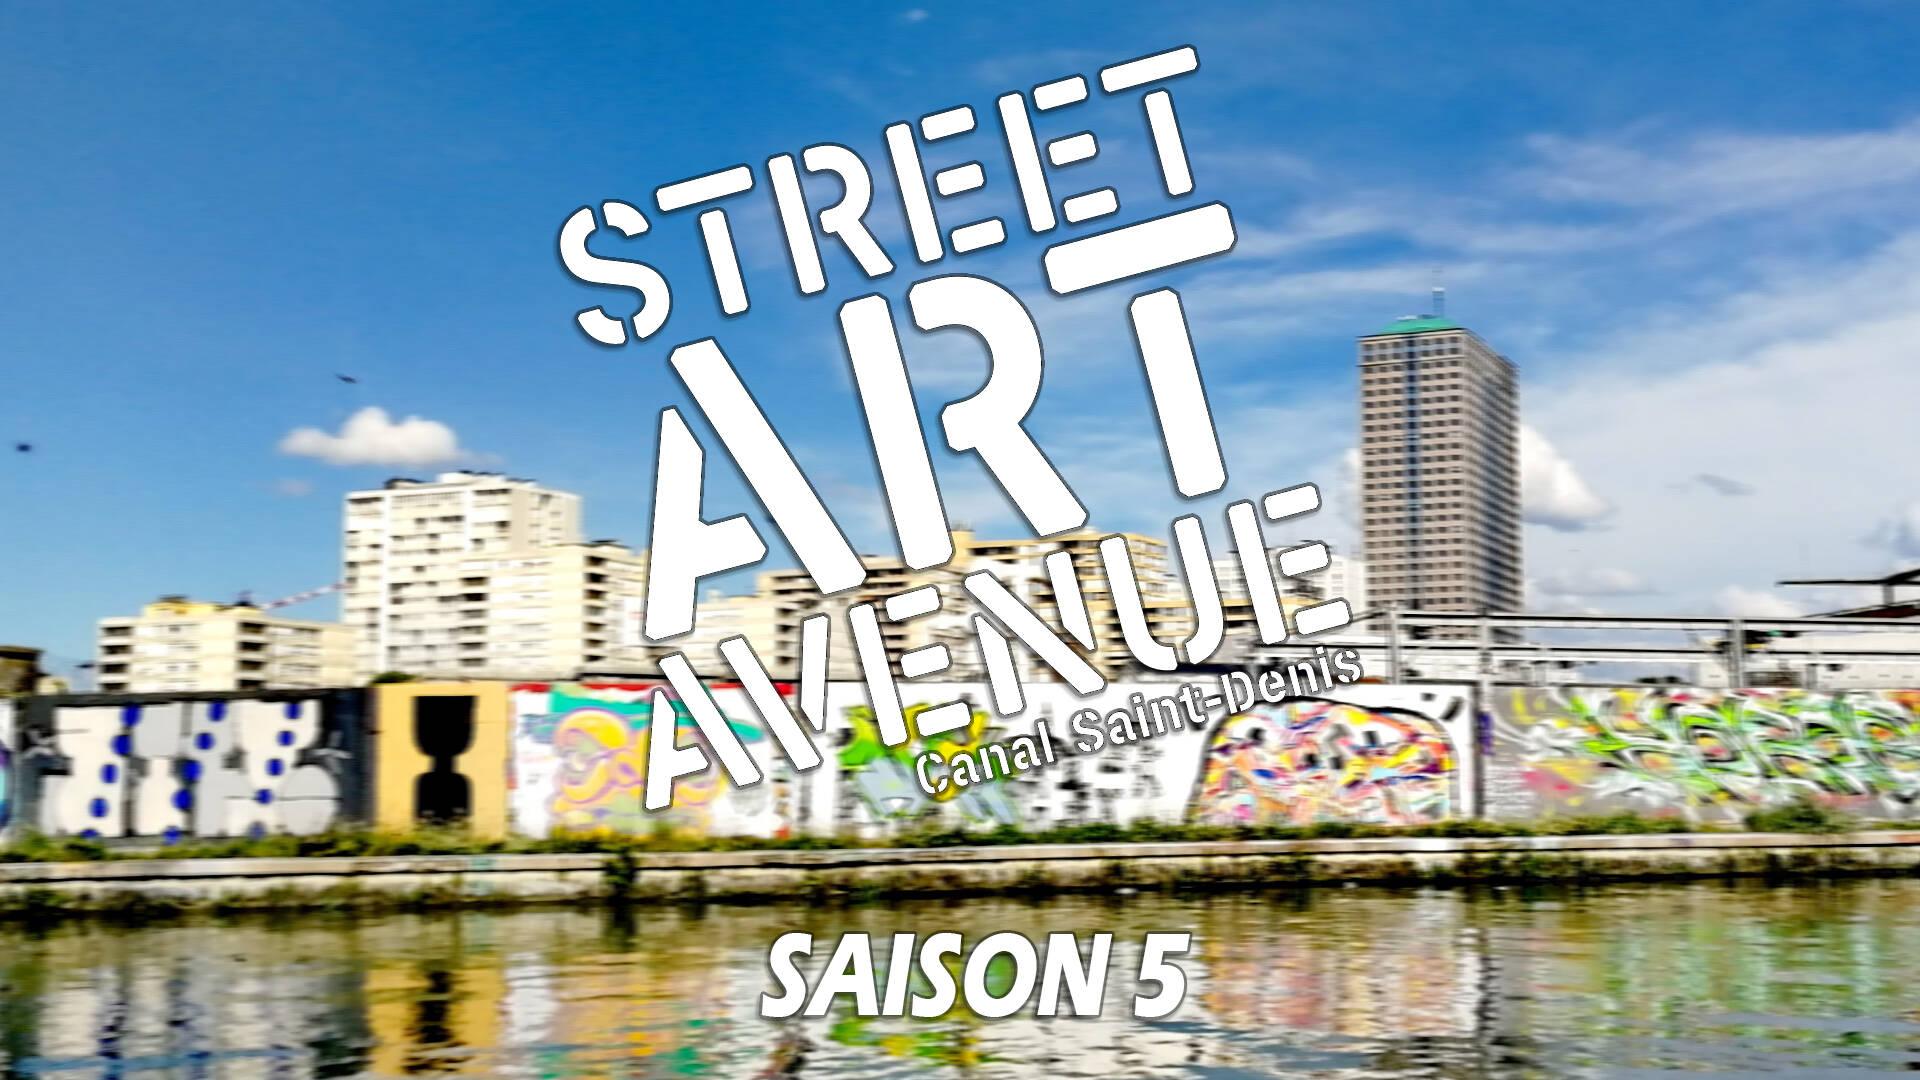 appel-a-projet-street-art-avenue-2020-saison-5